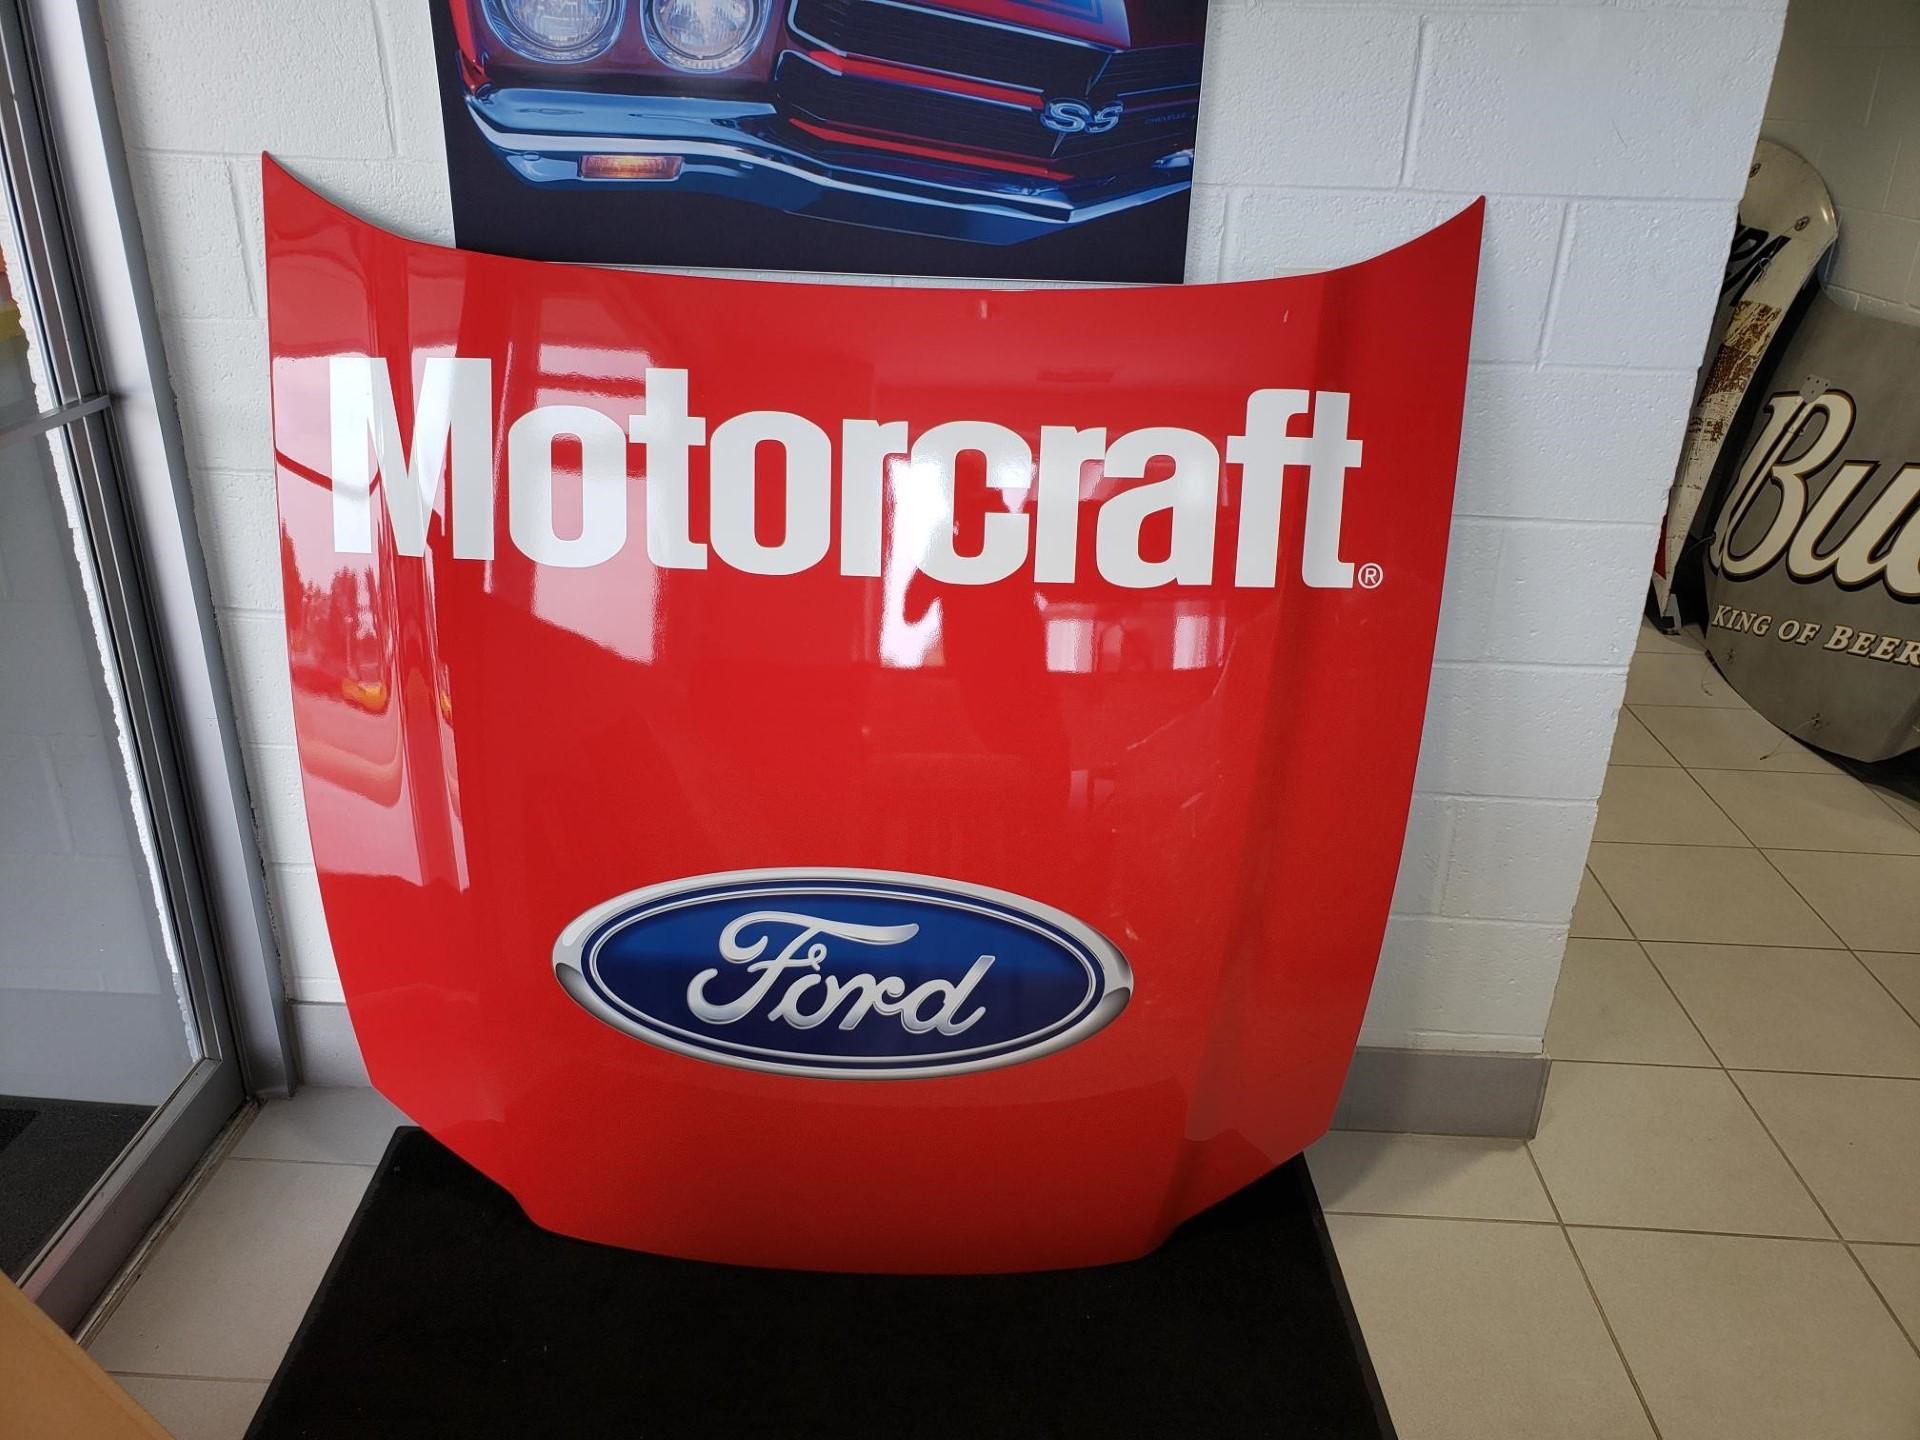 Ford Motorcraft Replica Mustang Hood